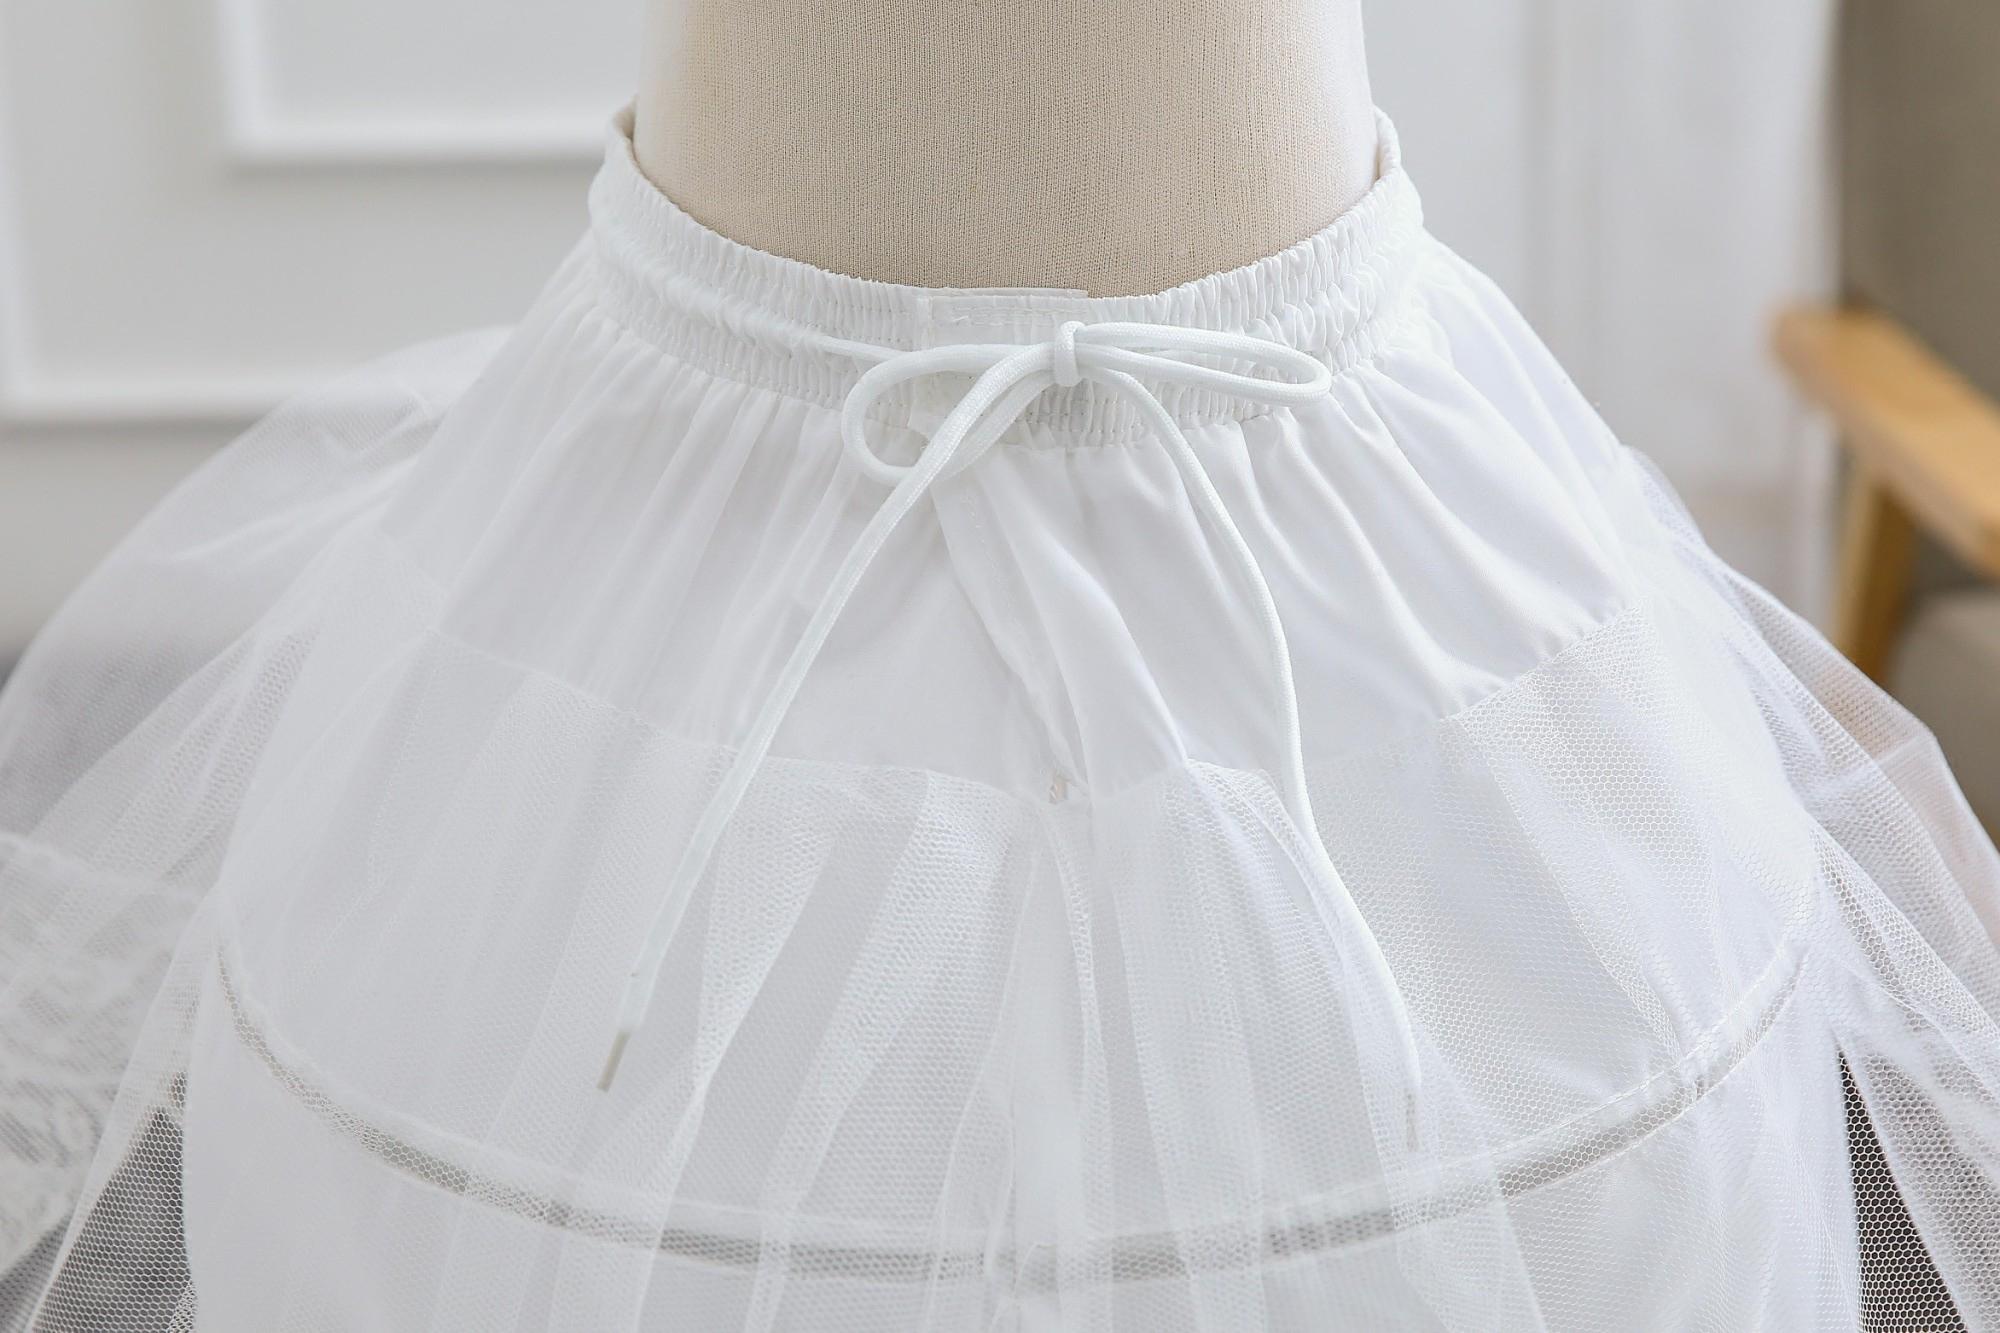 lolita 可调节暴力卡门衬裙软妹半身cosplay日常鱼骨裙撑洛丽塔